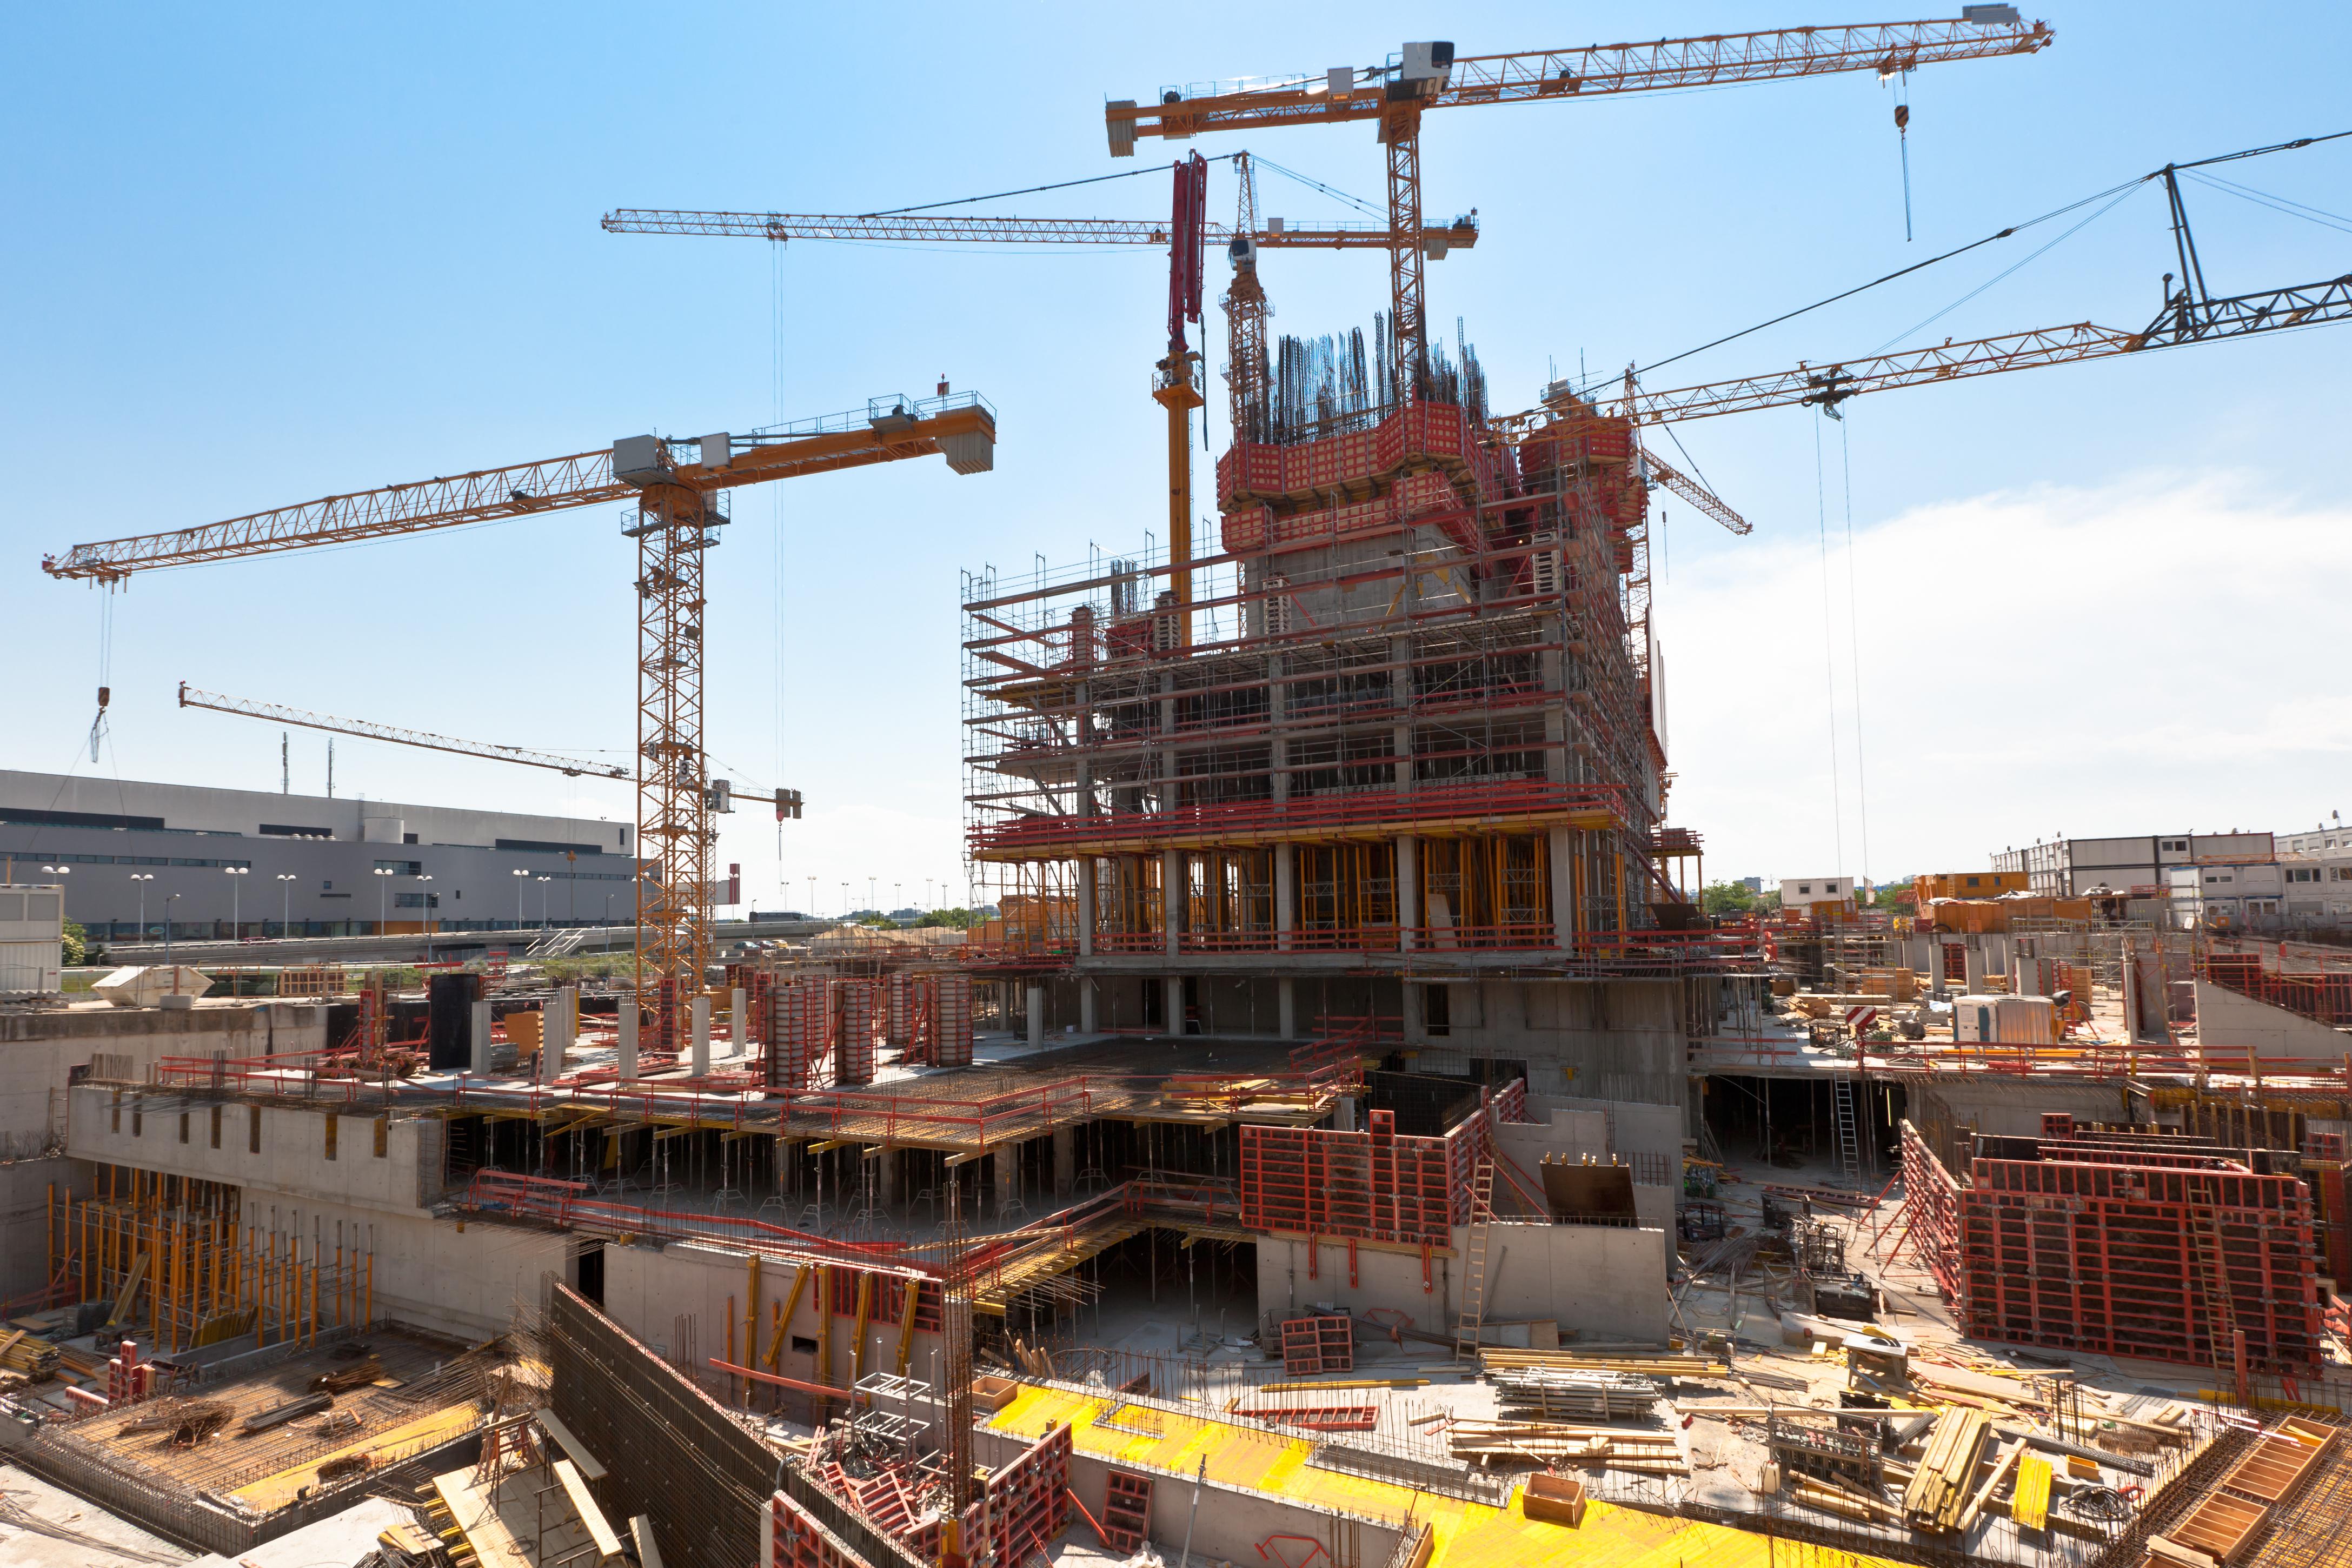 Building site_COLOURBOX5413190.jpg